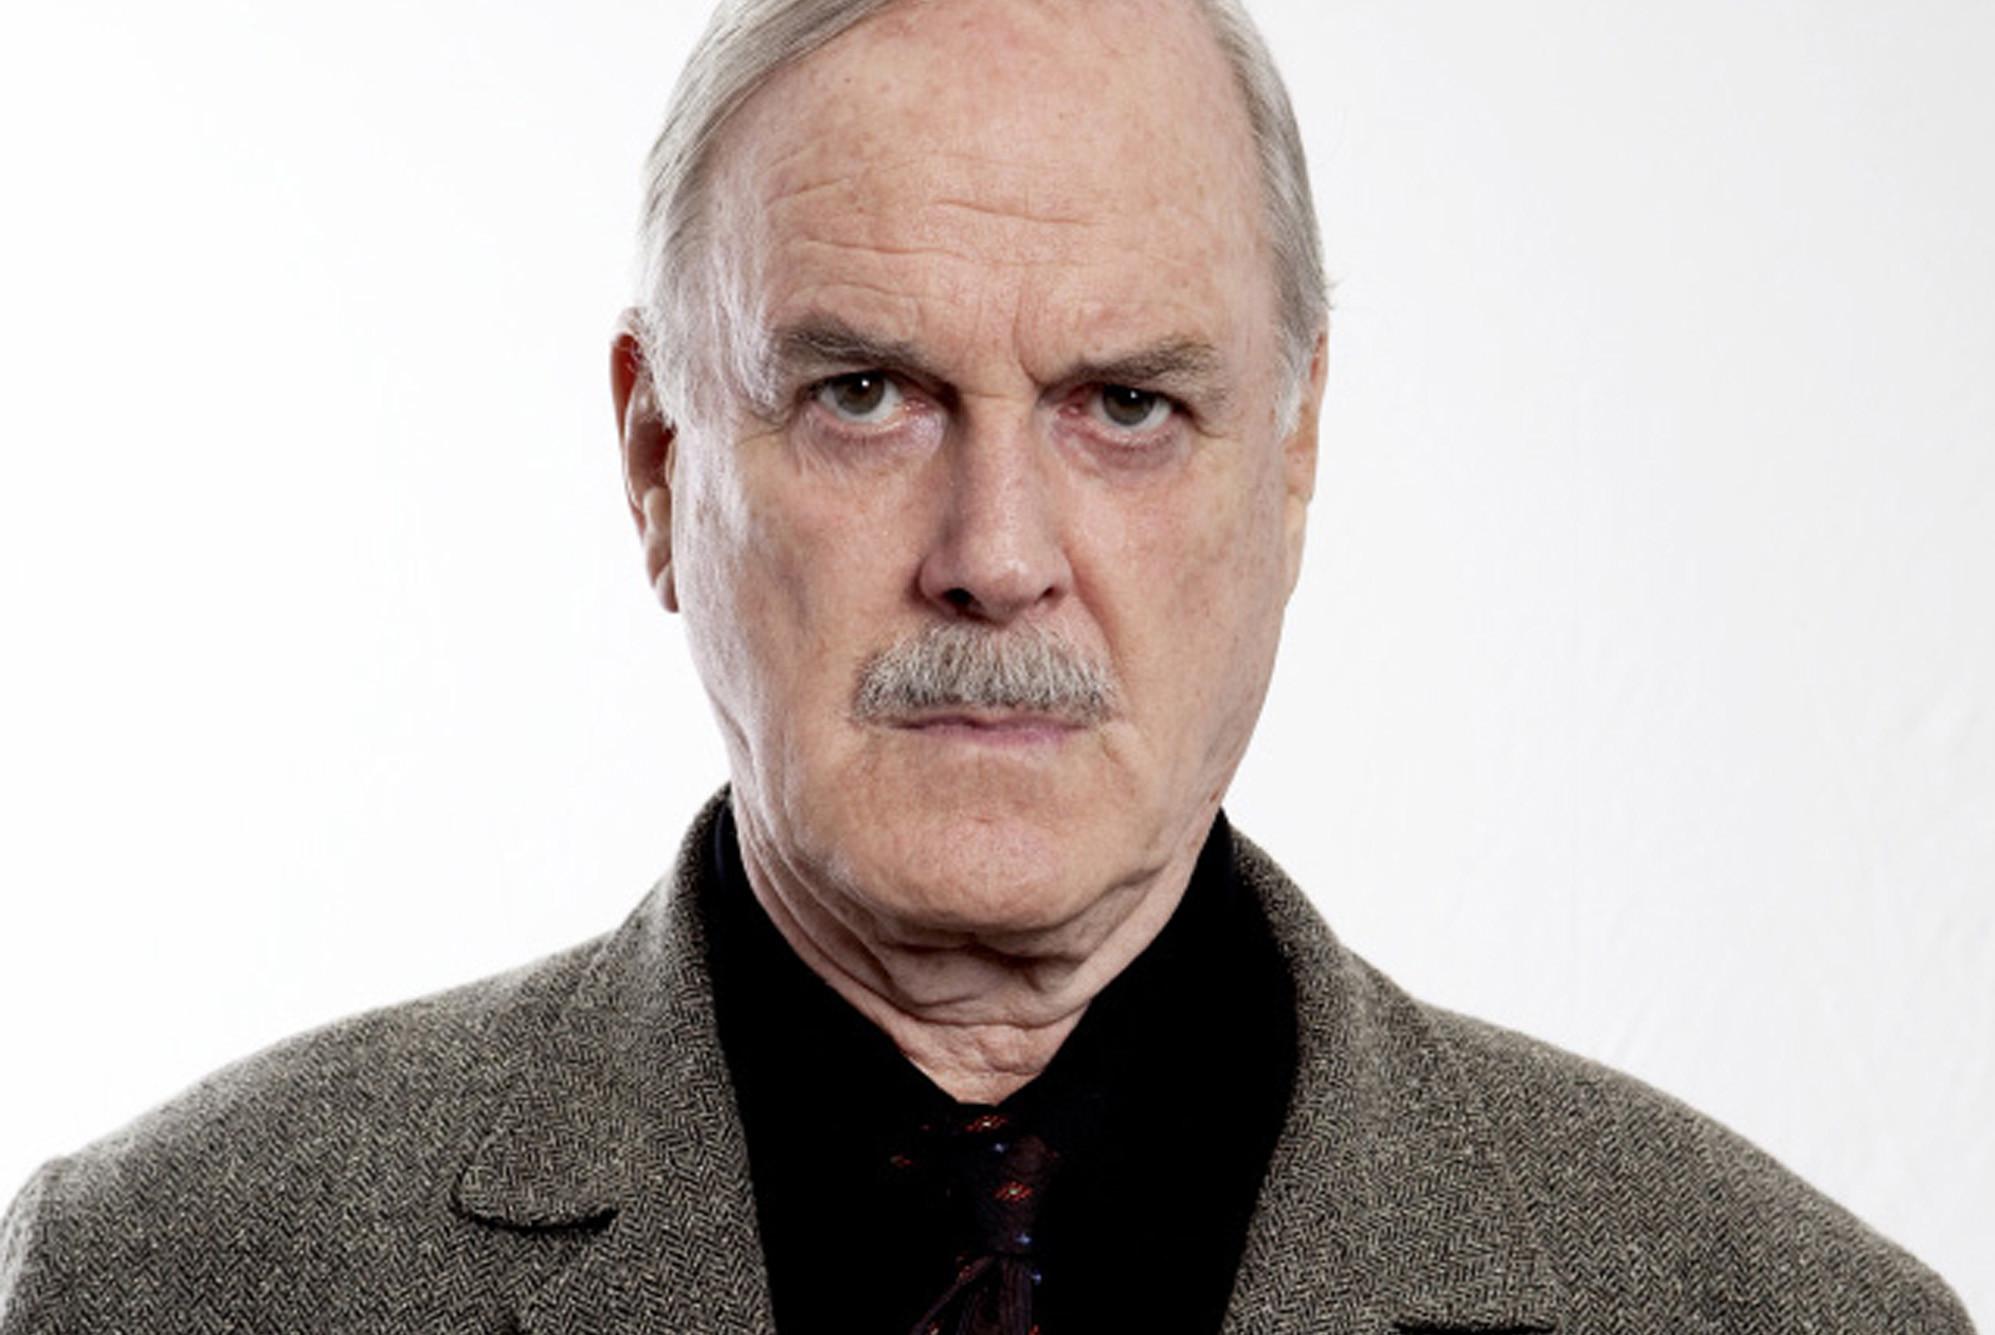 John Cleese (born 1939)